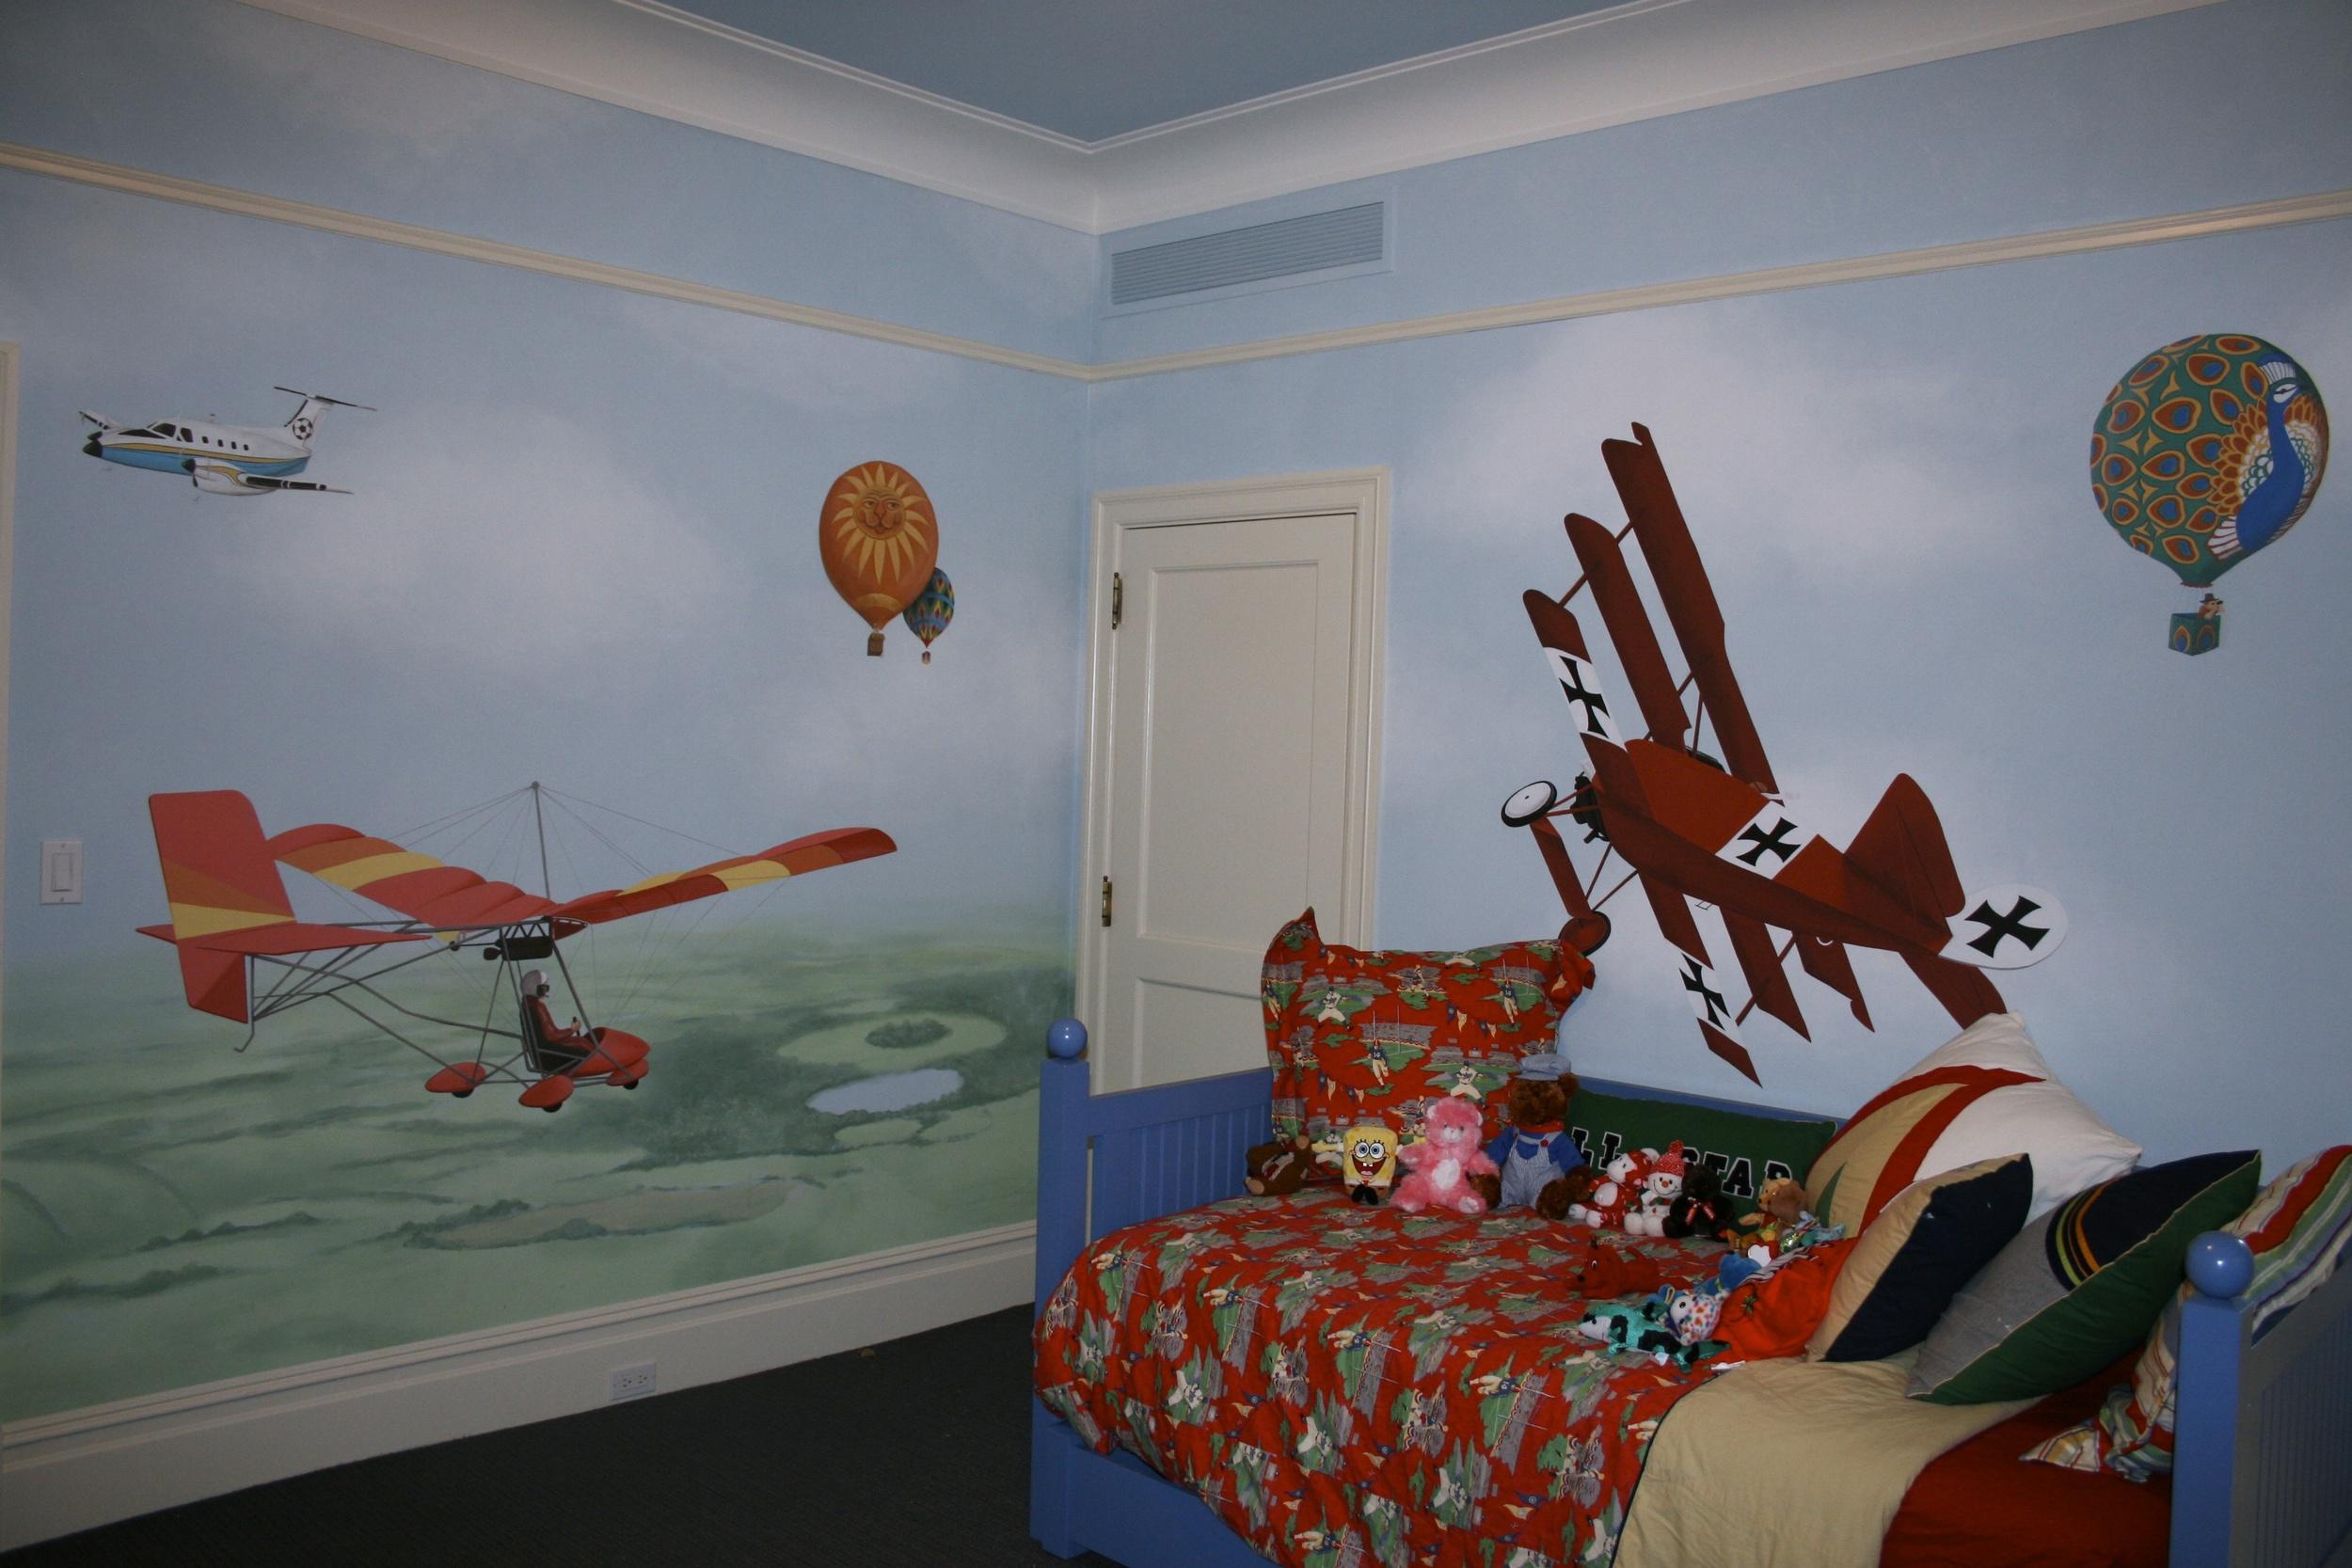 Airplane Mural